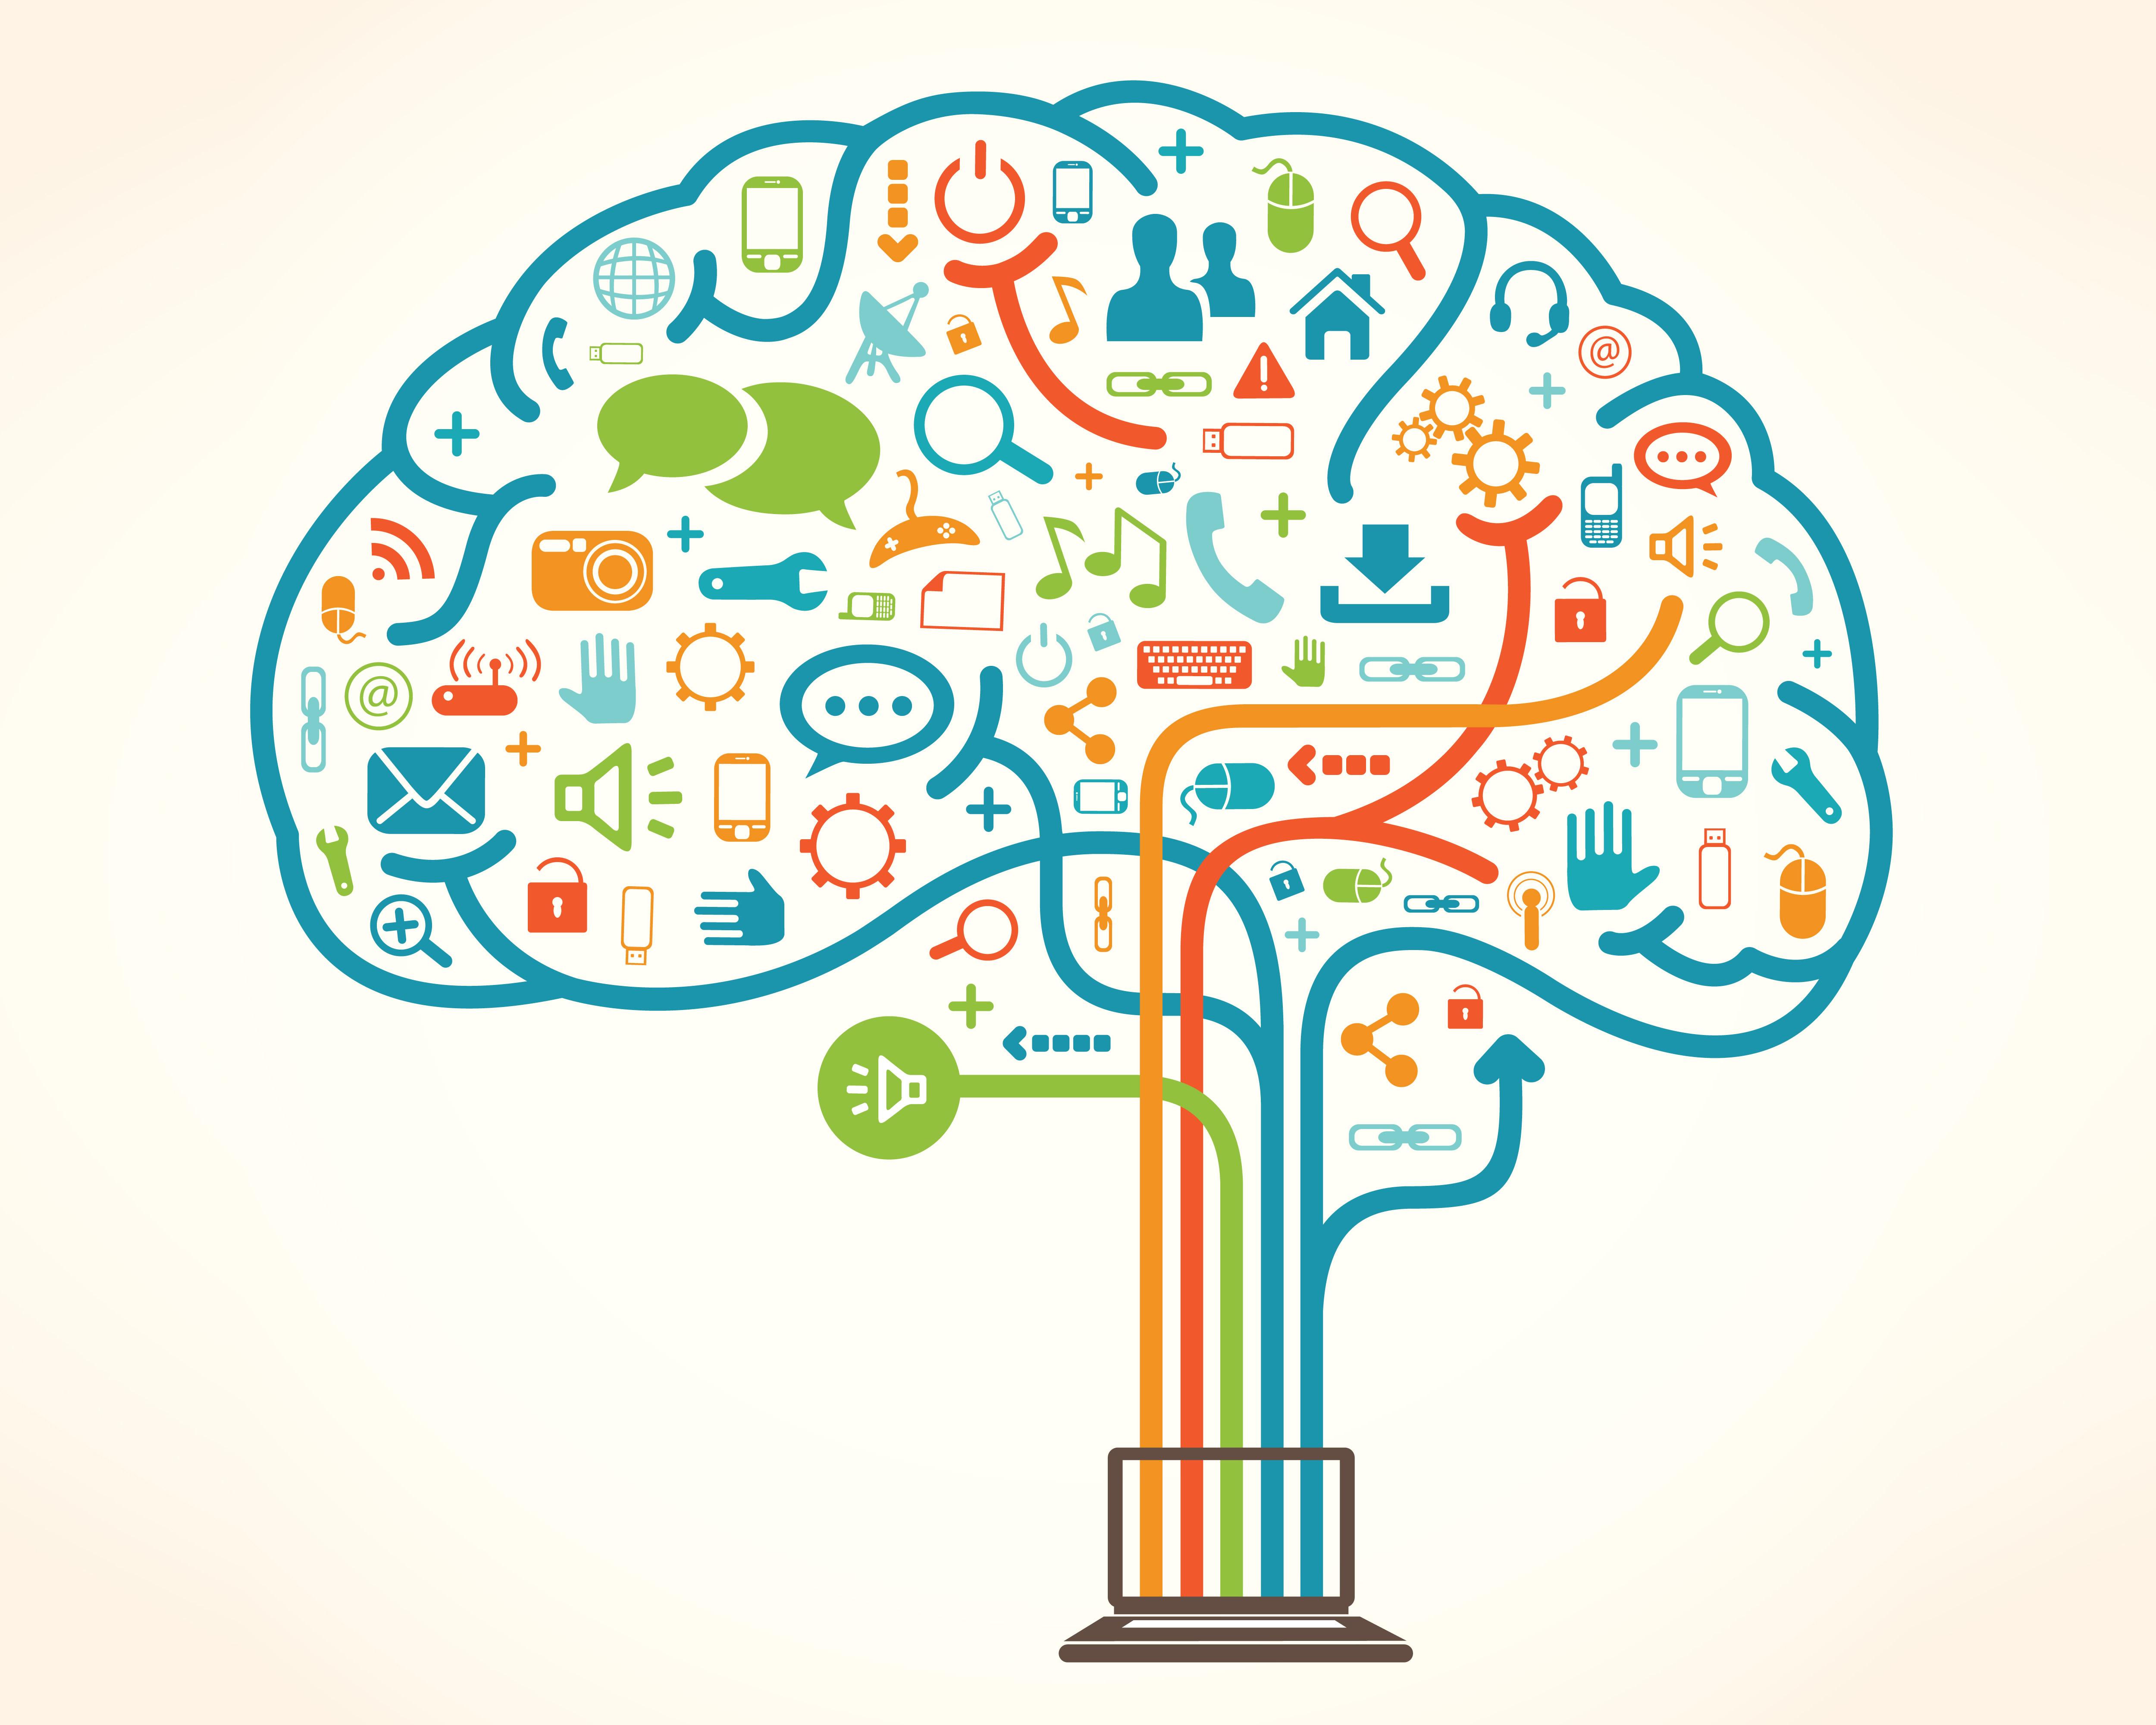 Brains clipart psychologist Hotels Over trigger  Affinity